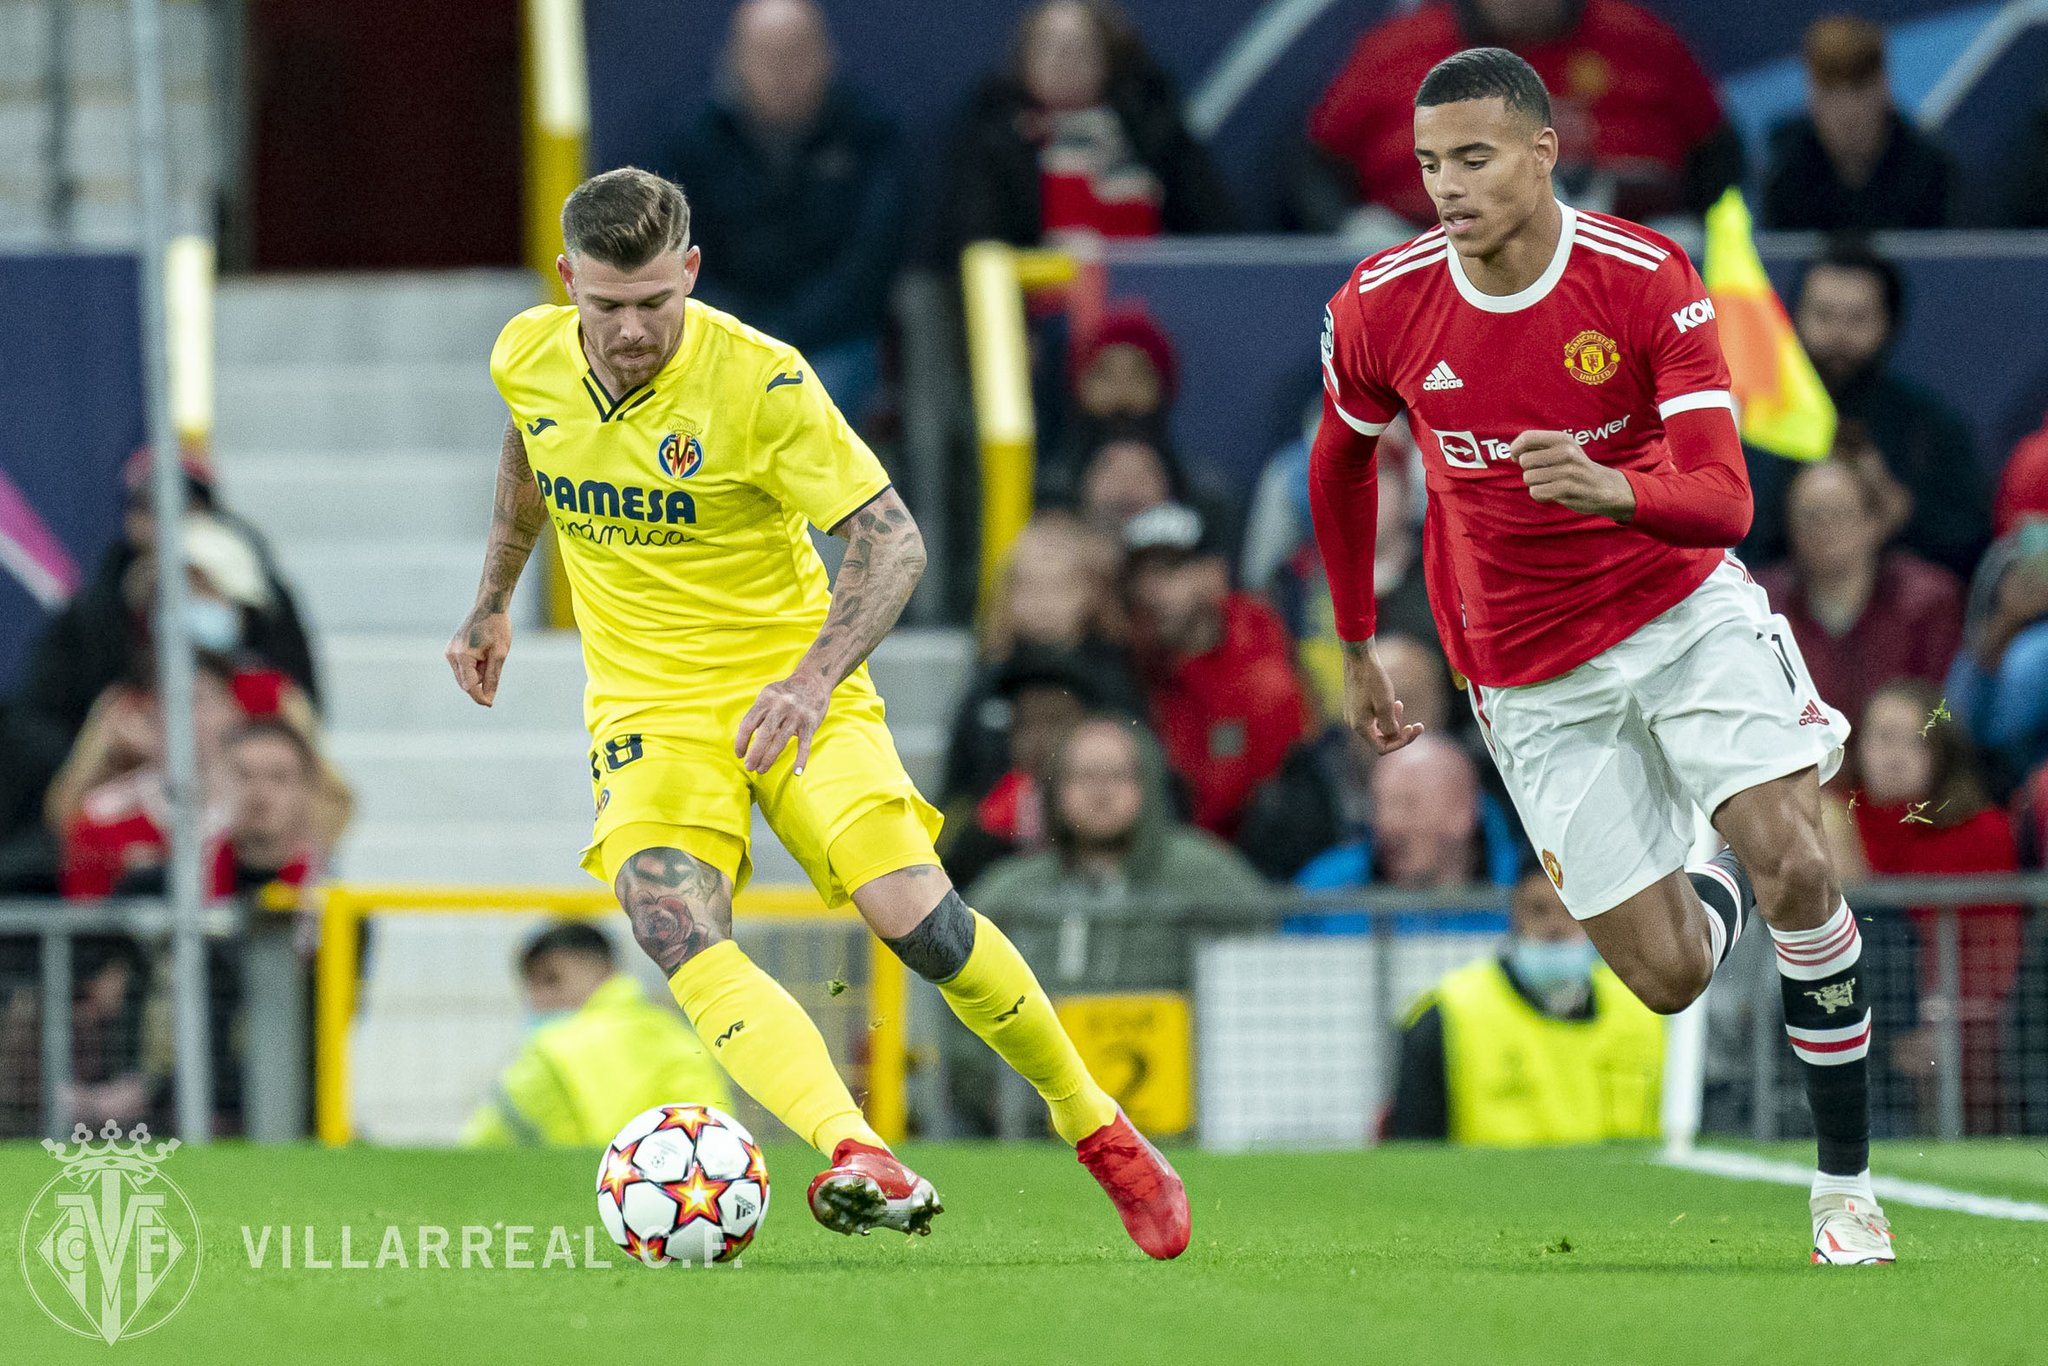 Man United vs Villarreal in the Champions League